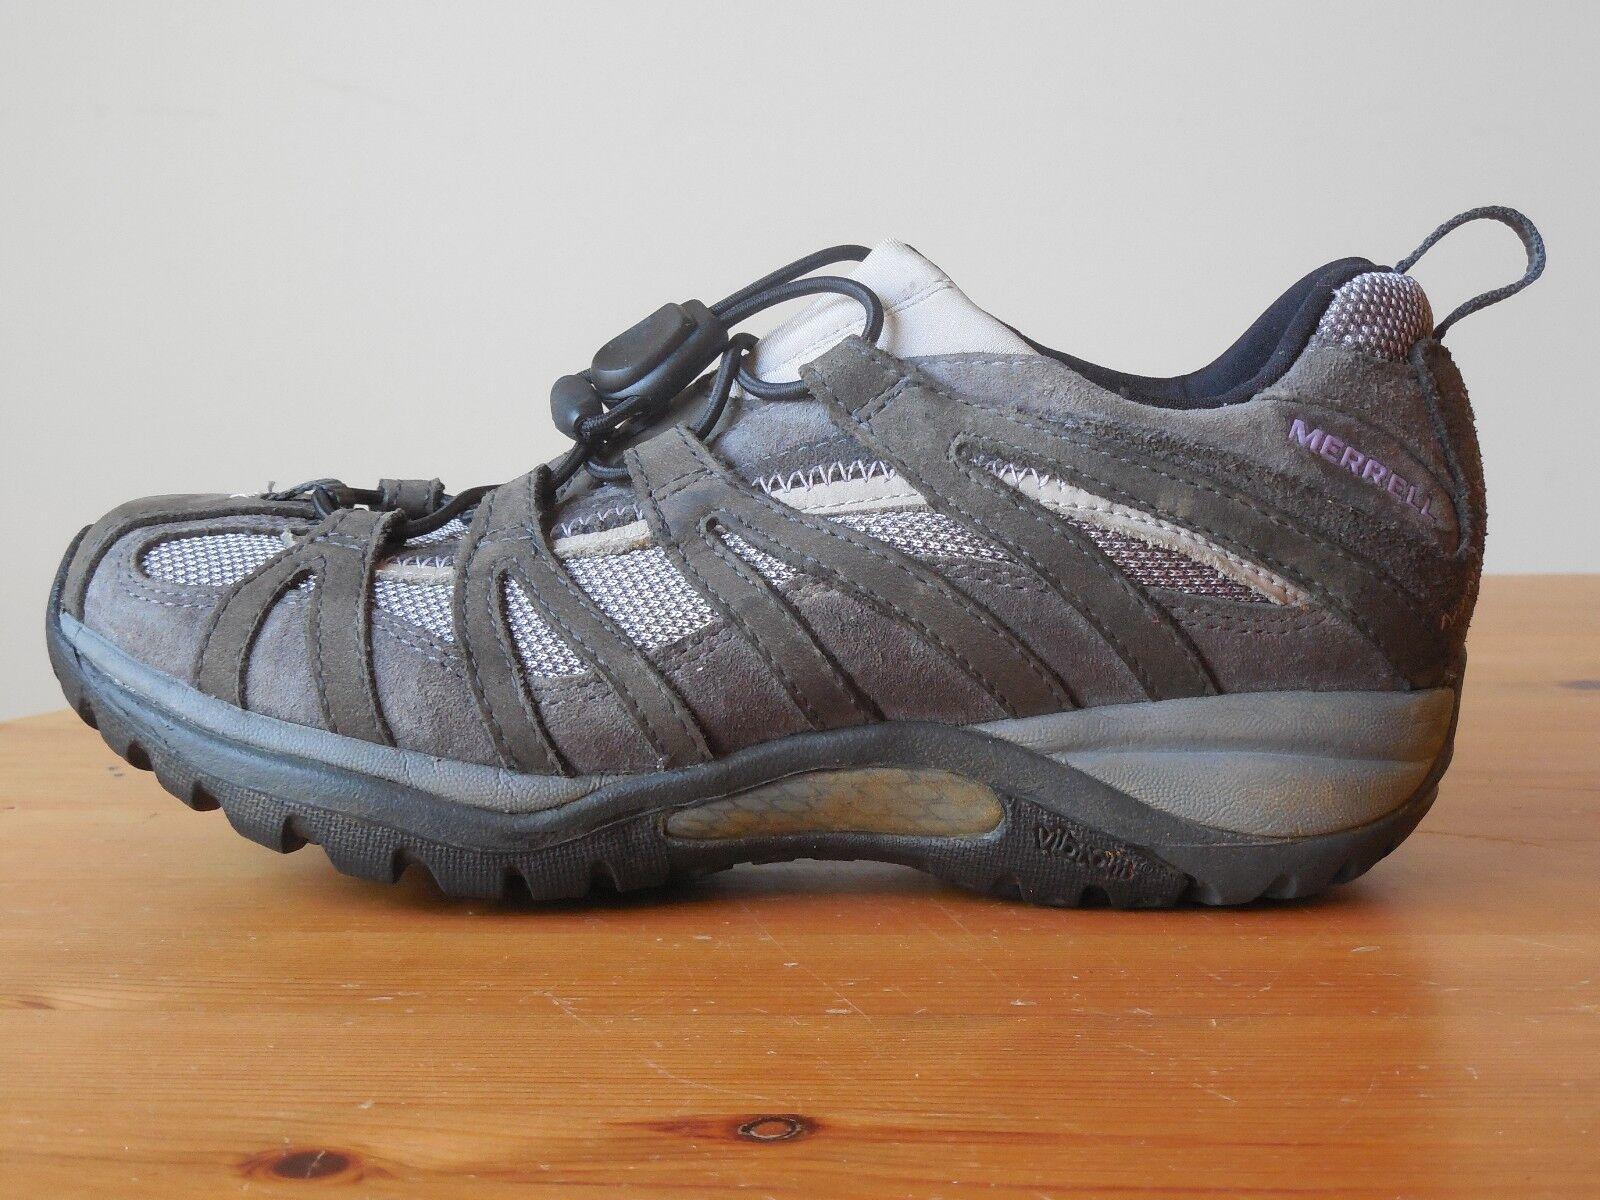 Merrell Slip On Trail Zapatos para mujer Talla 6.5 EE. EE. EE. UU. plantilla Ortholite Suela Vibram  mejor marca